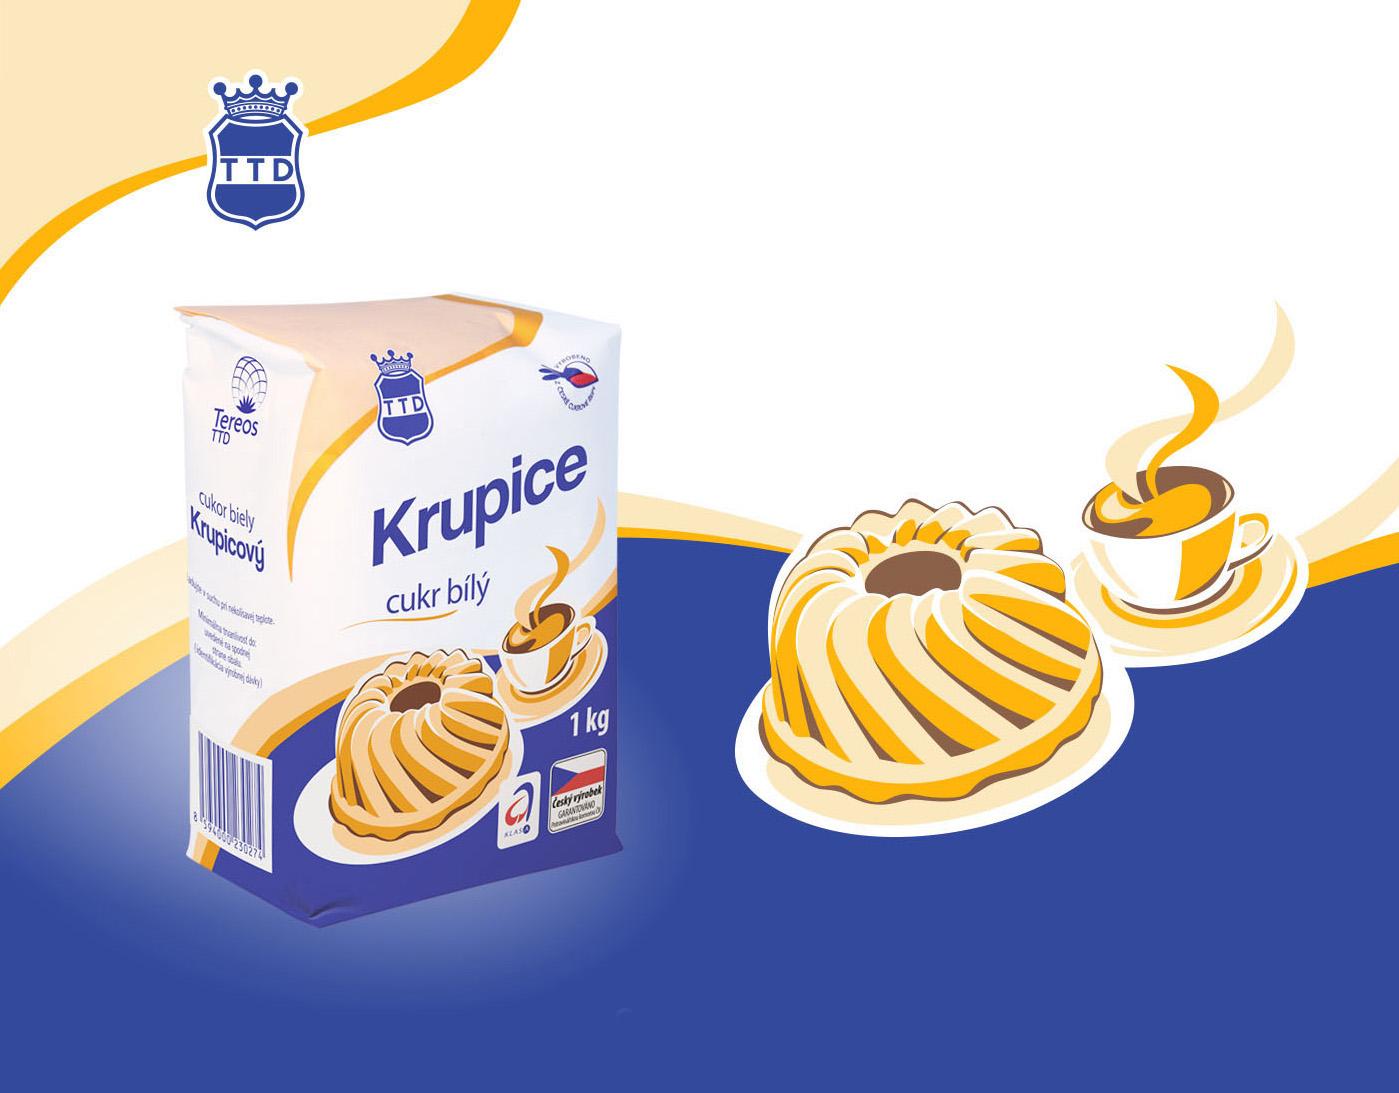 Obalový design - Tereos TTD cukr Krupice